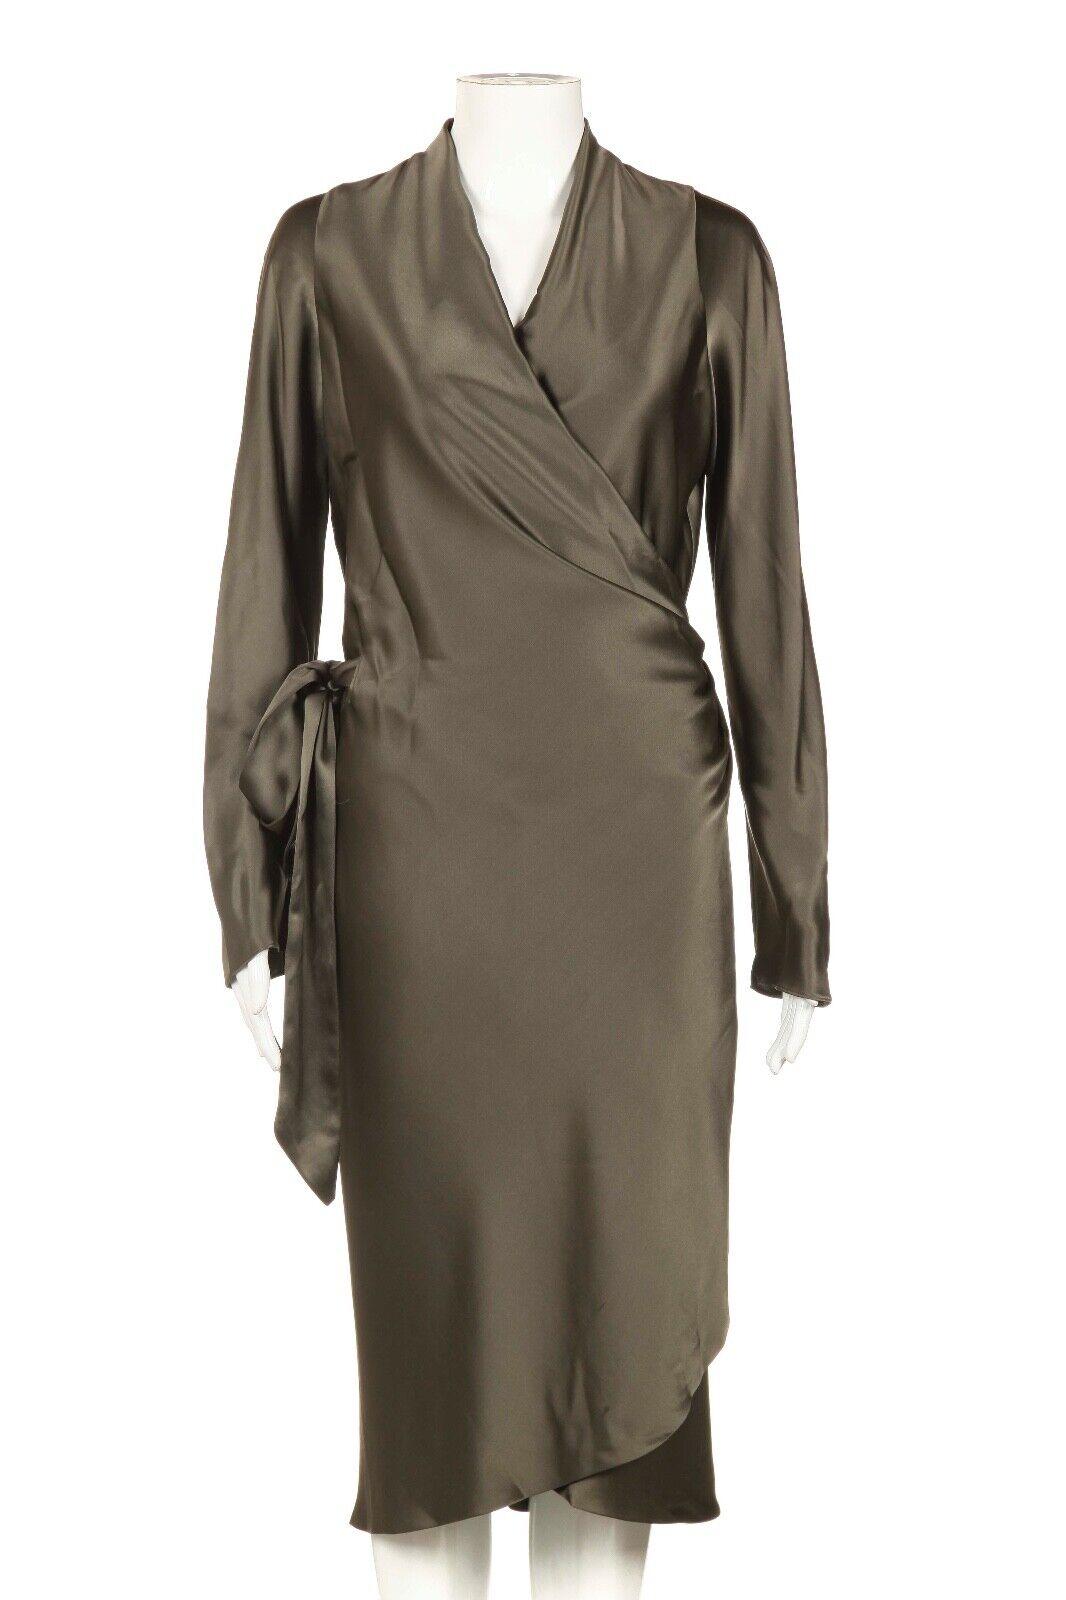 NWT PETER COHEN 100% Silk kortstop Wrat Dress Medium grön Satin Long Sleve